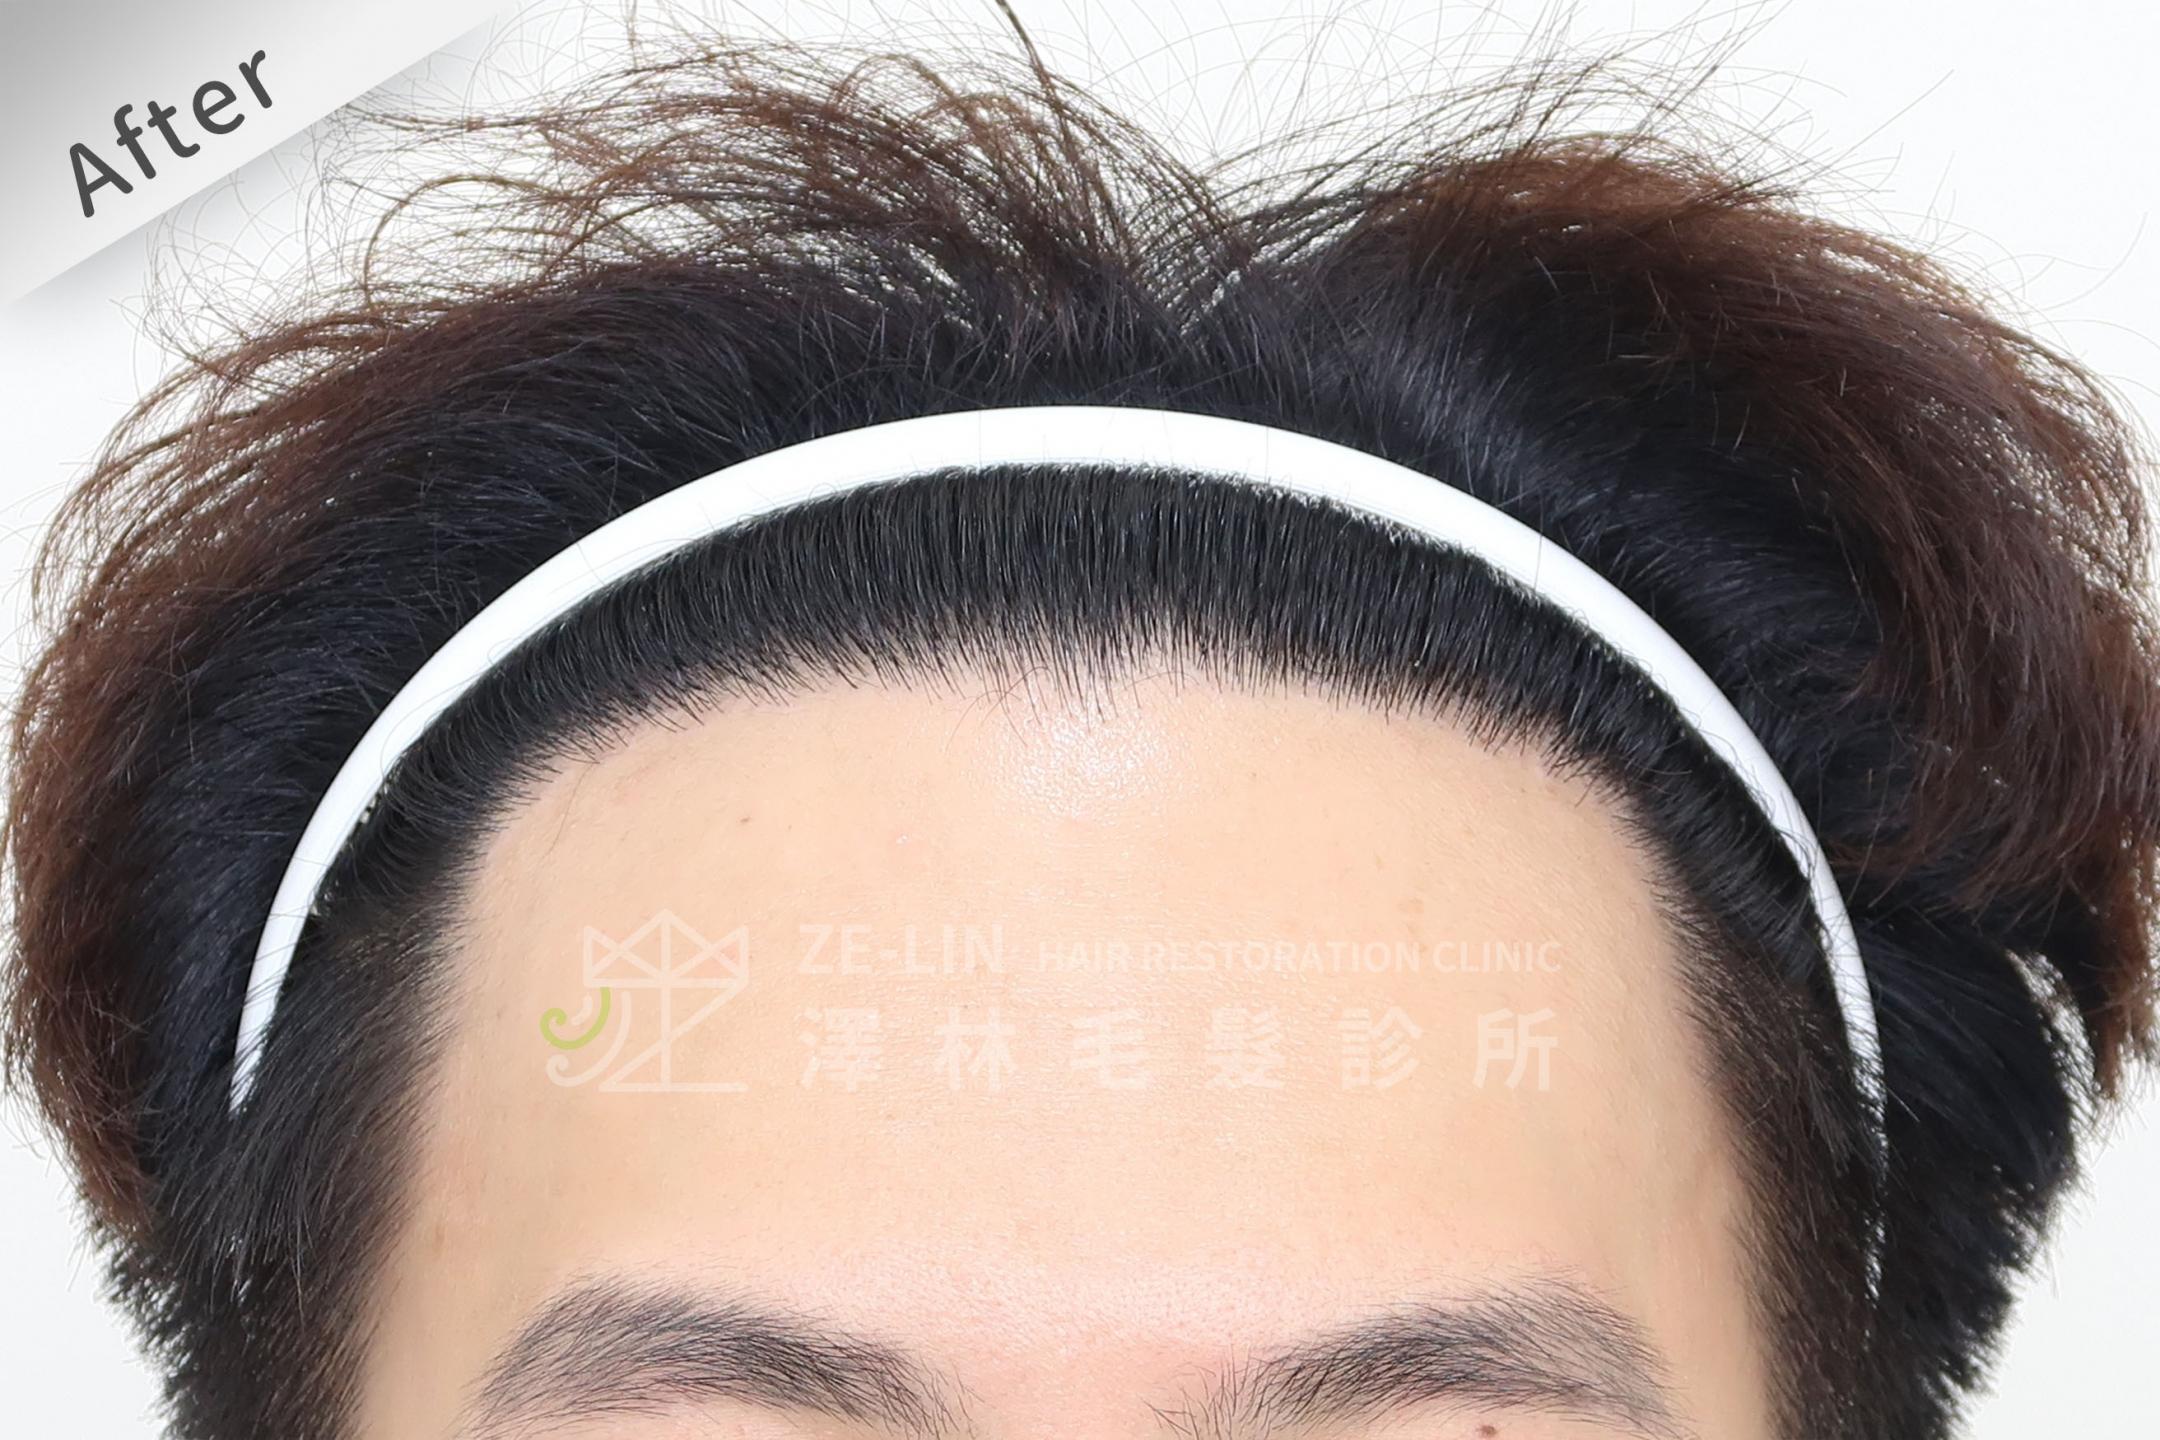 M型雄性髮際線FUE植髮手術高存活率案例心得分享術後